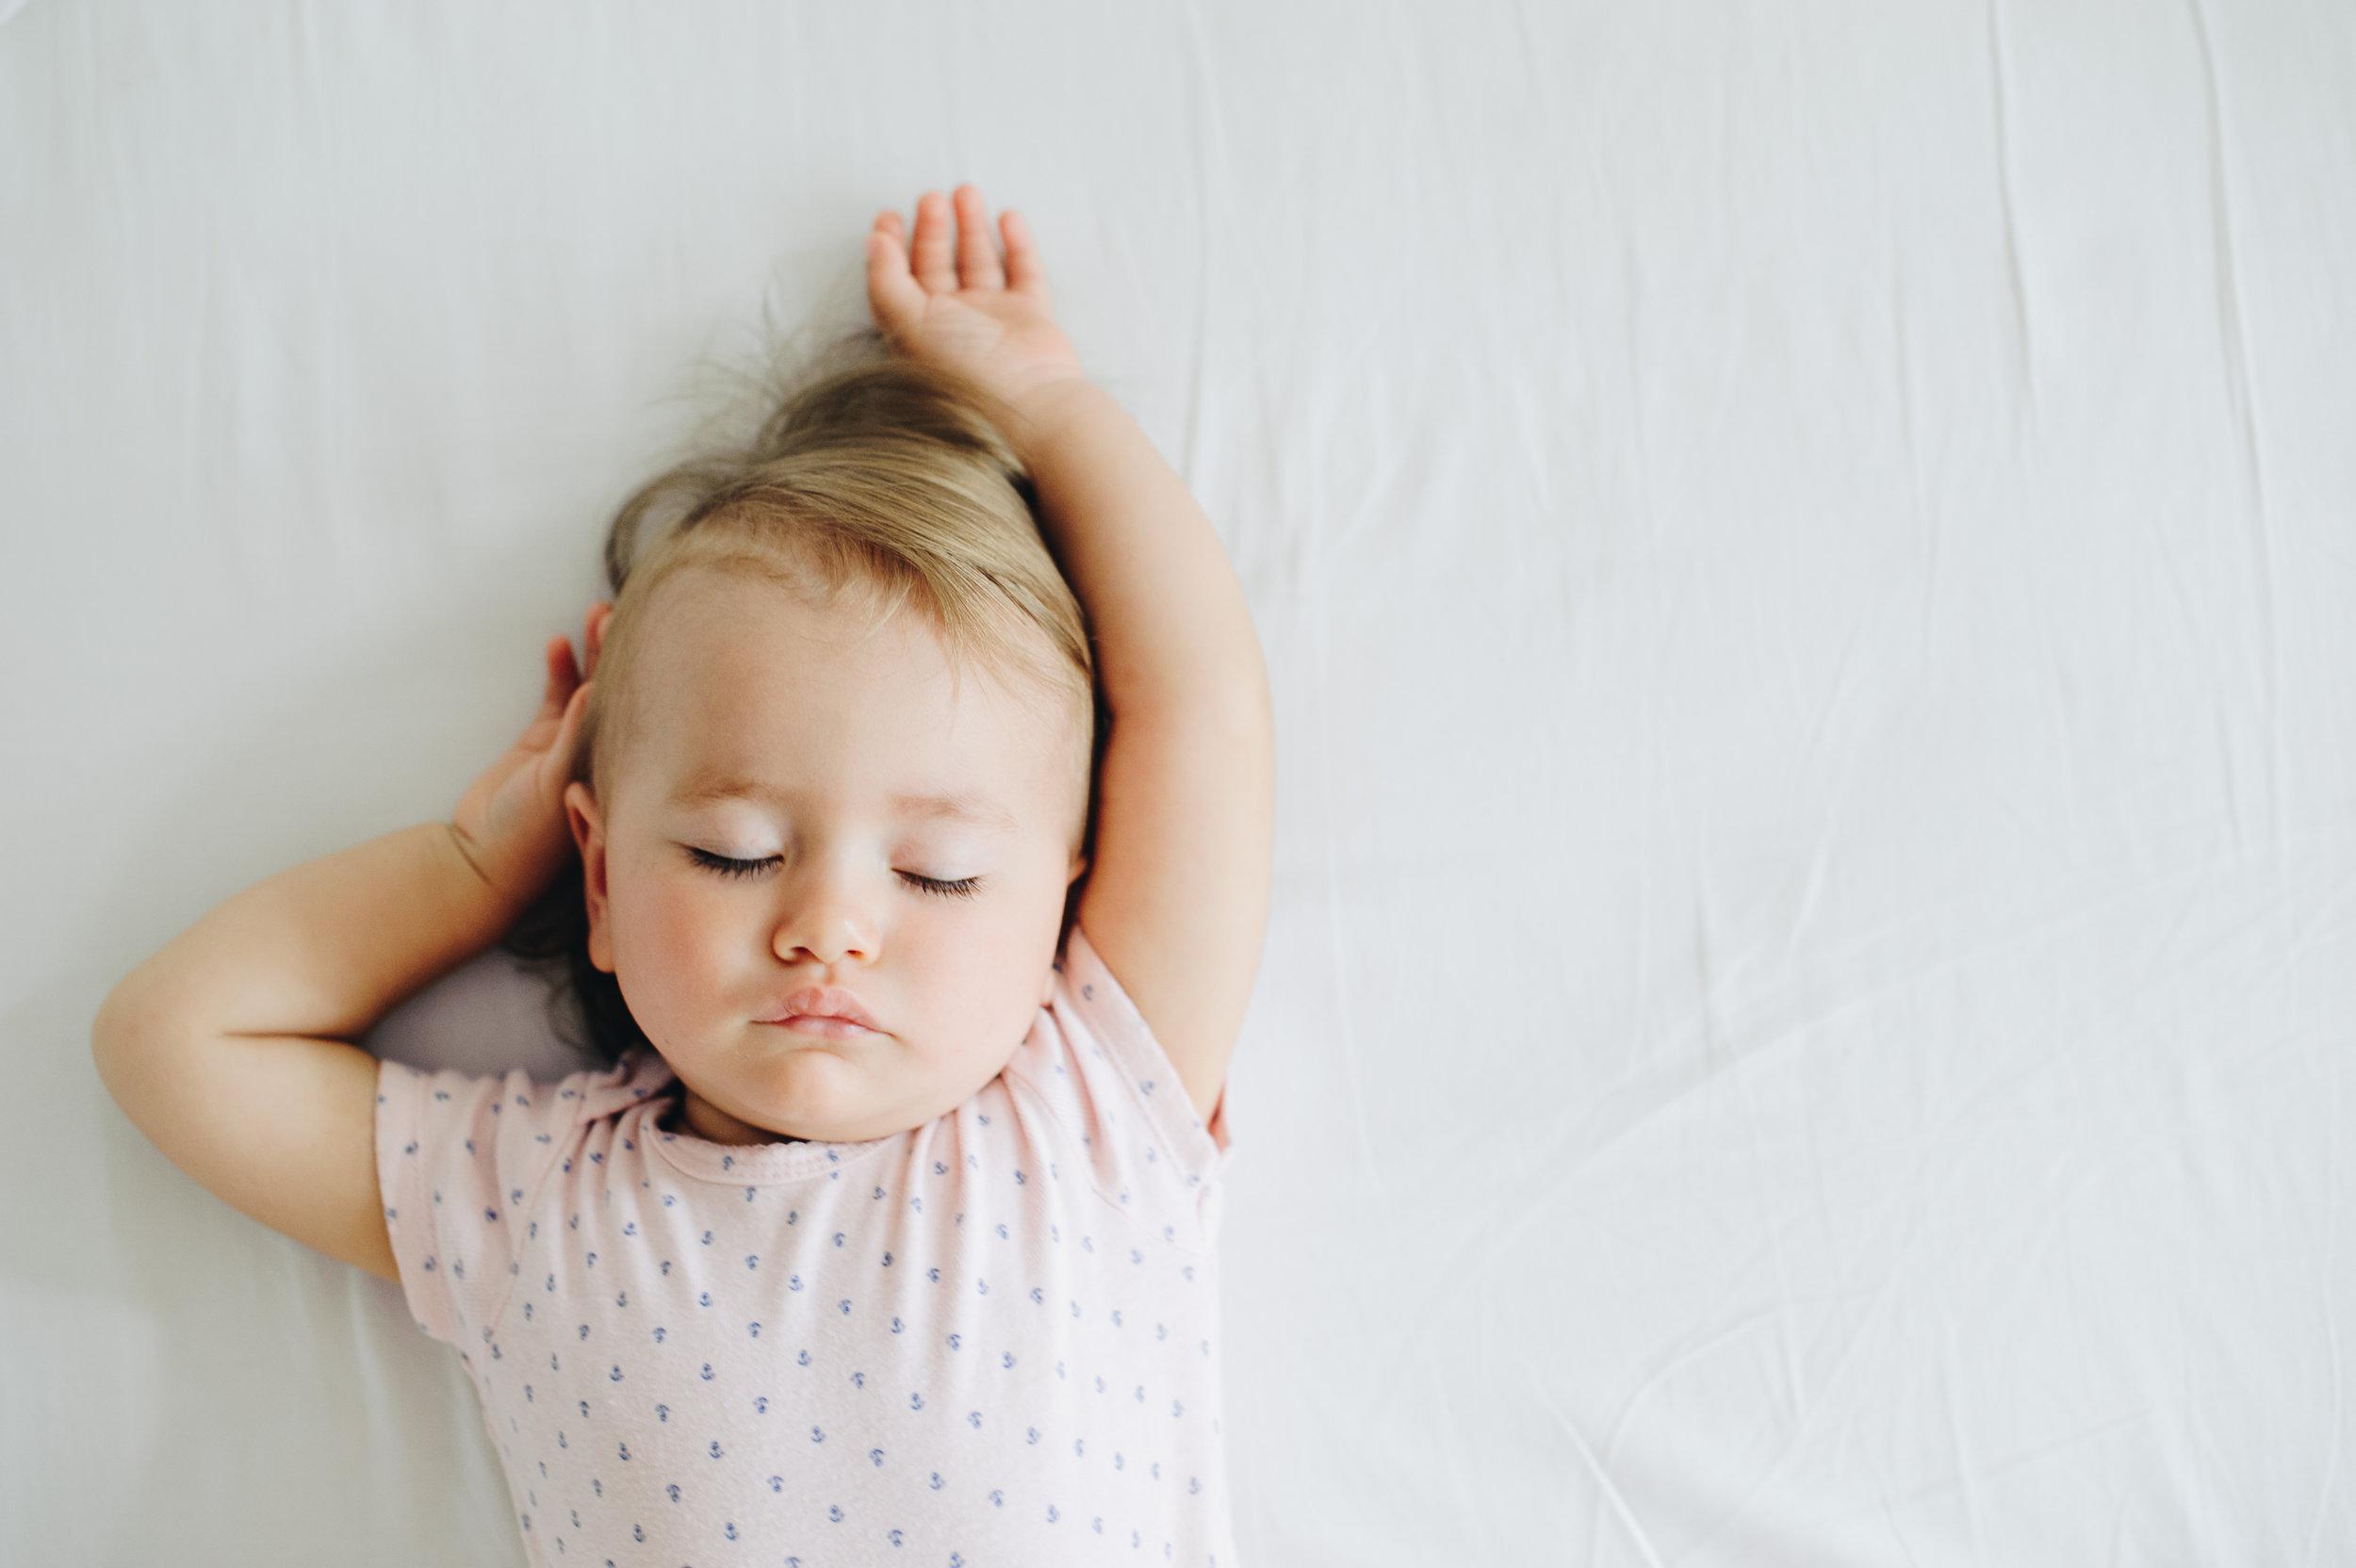 A-B-SLEEP – Pediatric Sleep Consulting